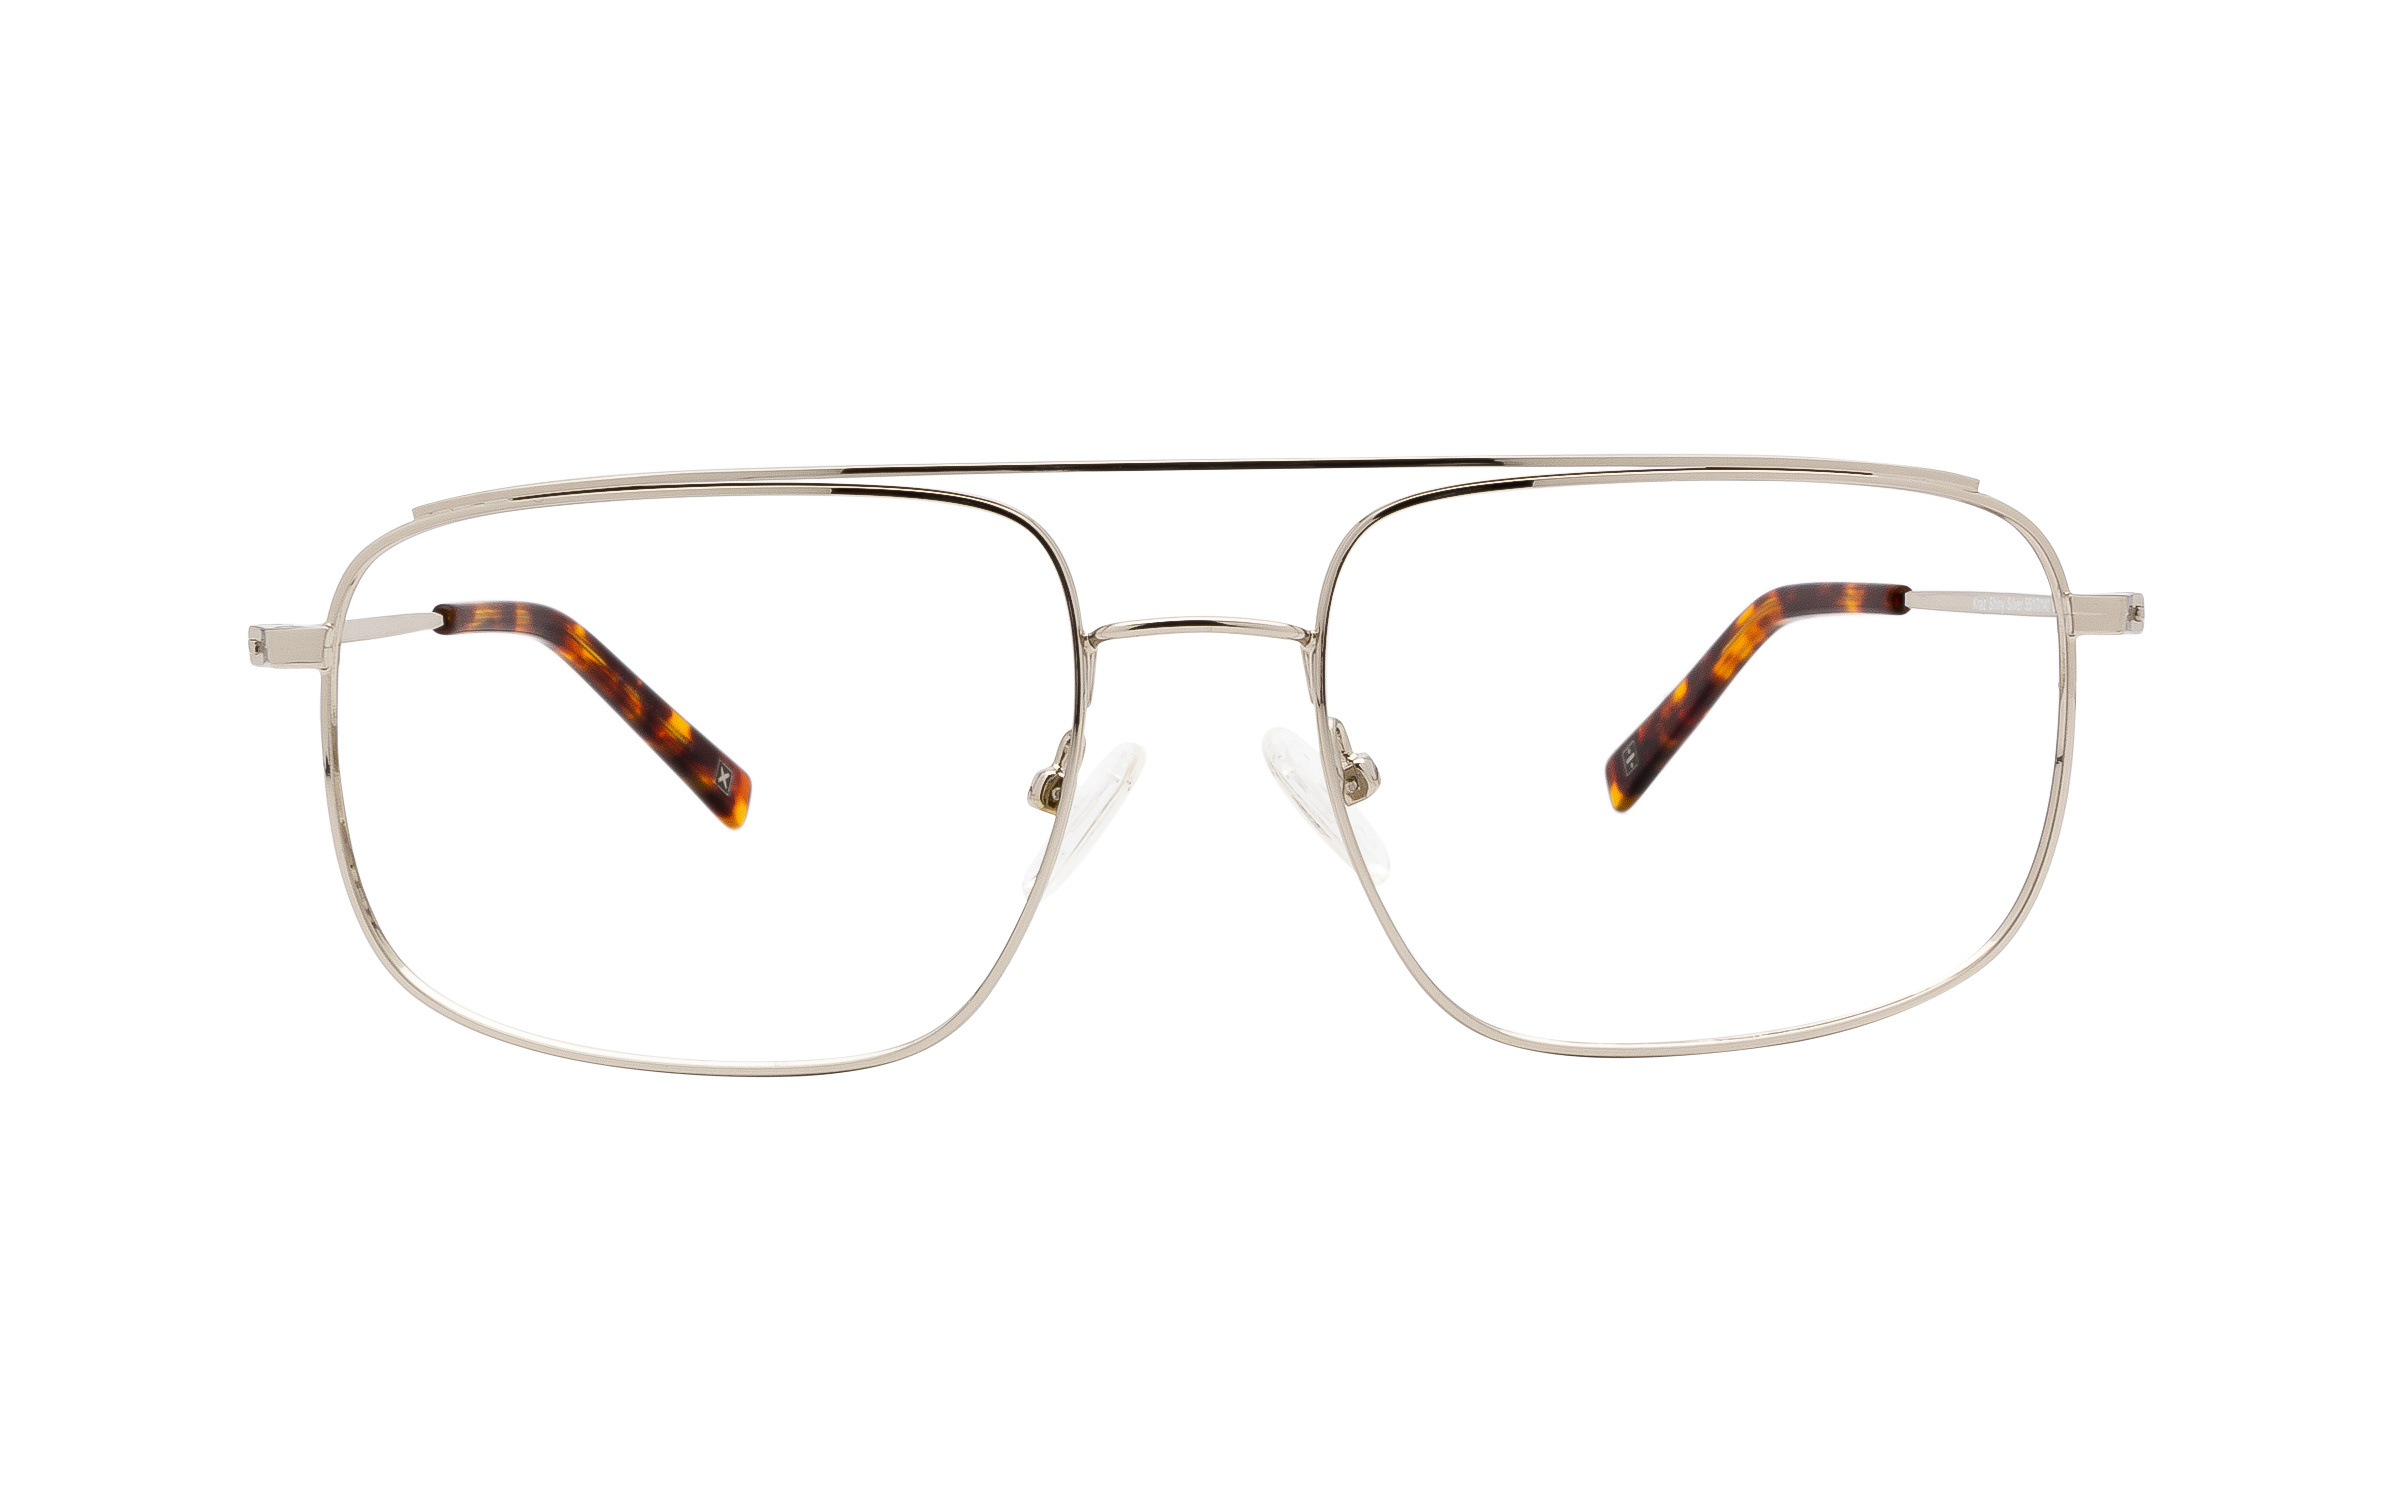 http://www.coastal.com/ - Derek Cardigan Kraz DC221 C02 (55) Eyeglasses and Frame in Shiny Silver | Metal – Online Coastal